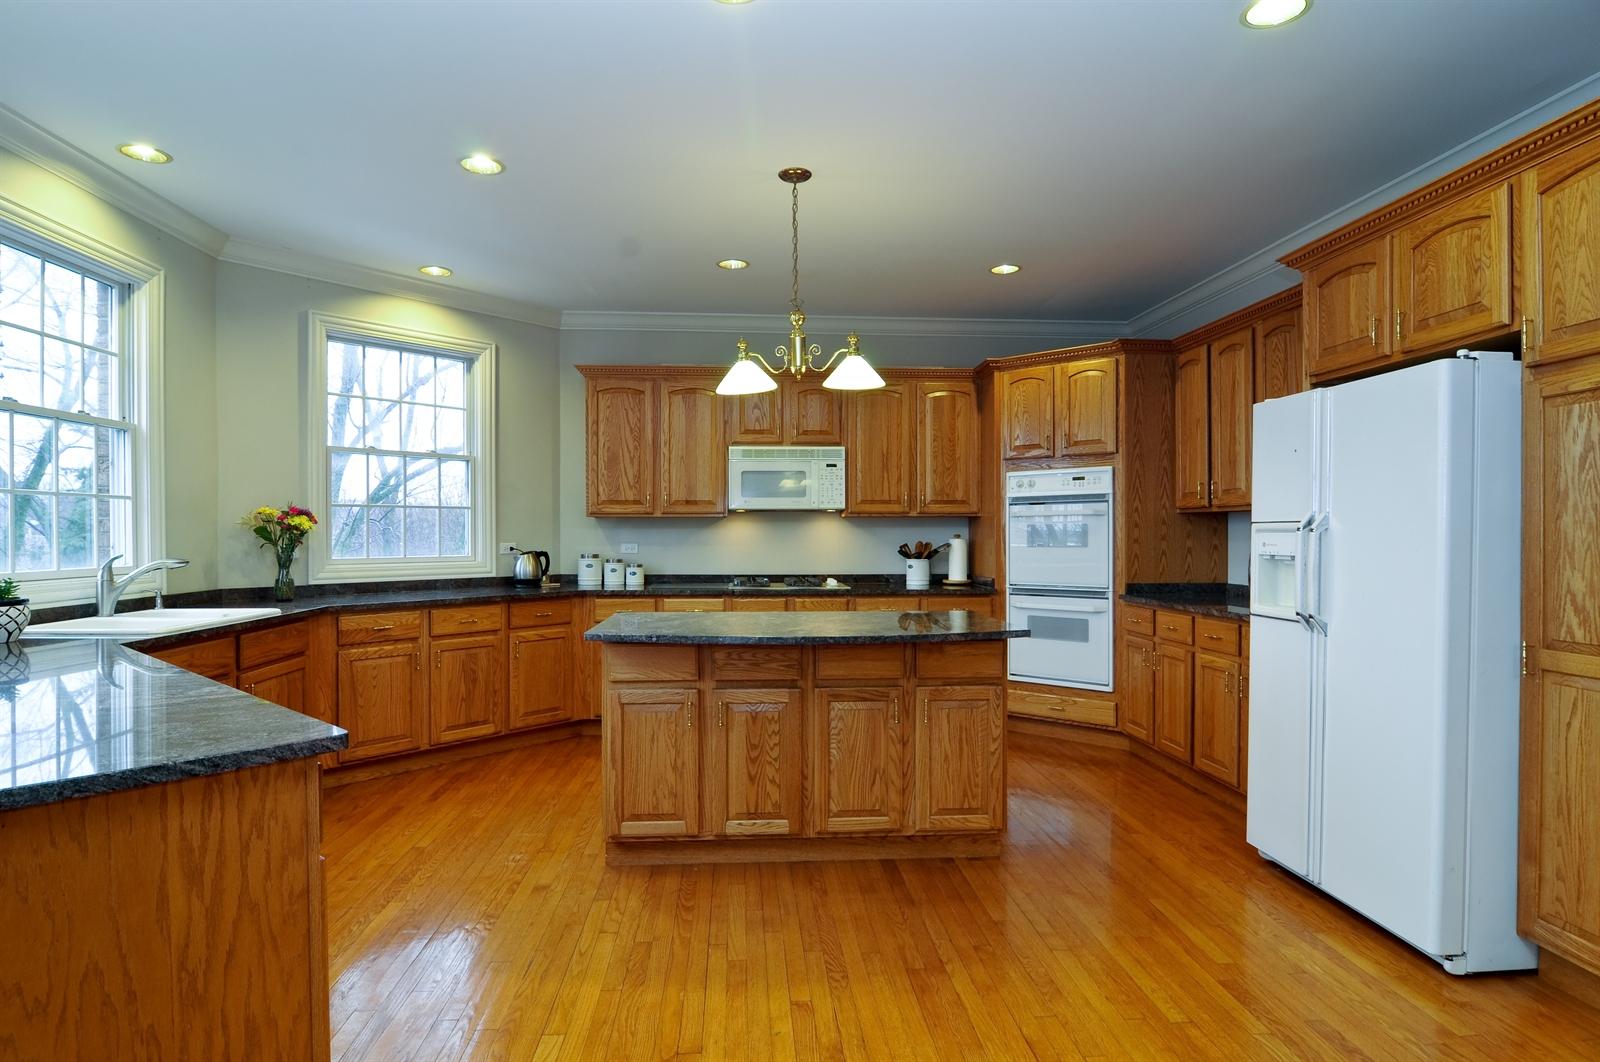 Real Estate Photography - 1020 Oakland, Barrington, IL, 60010 - Kitchen